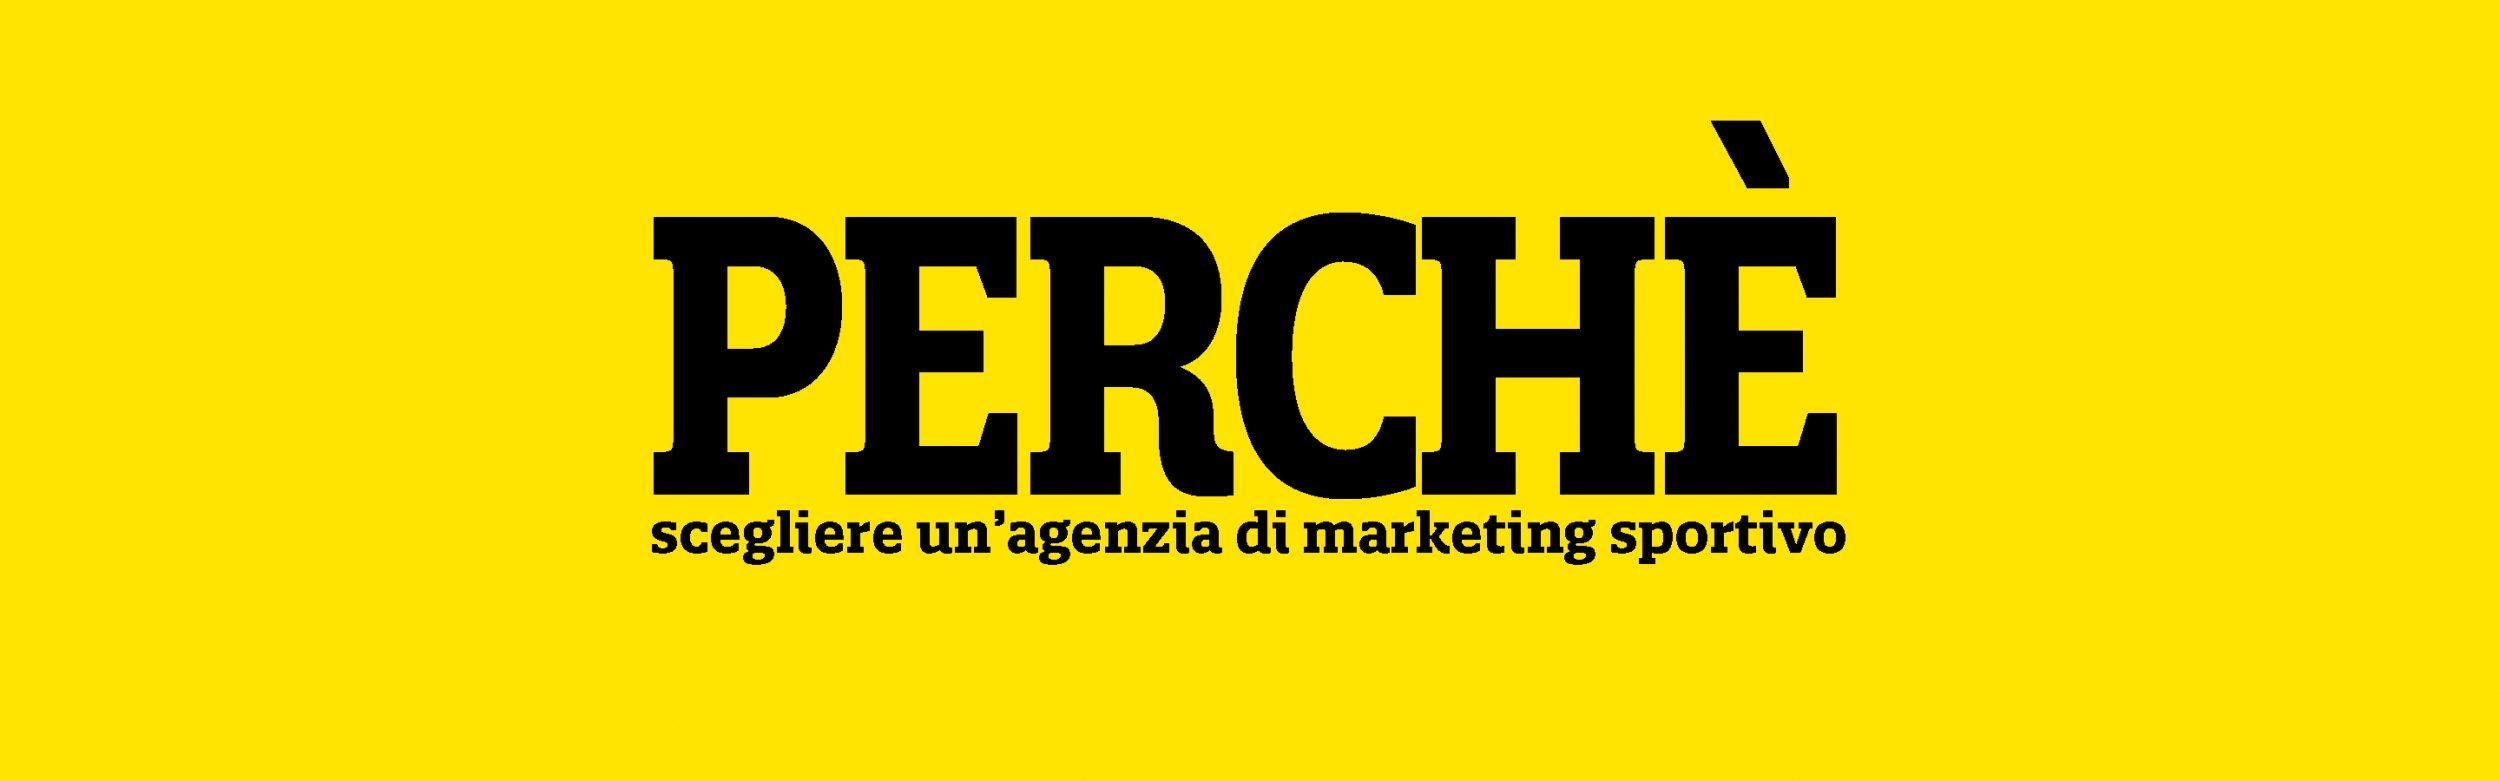 marketing-sportivo